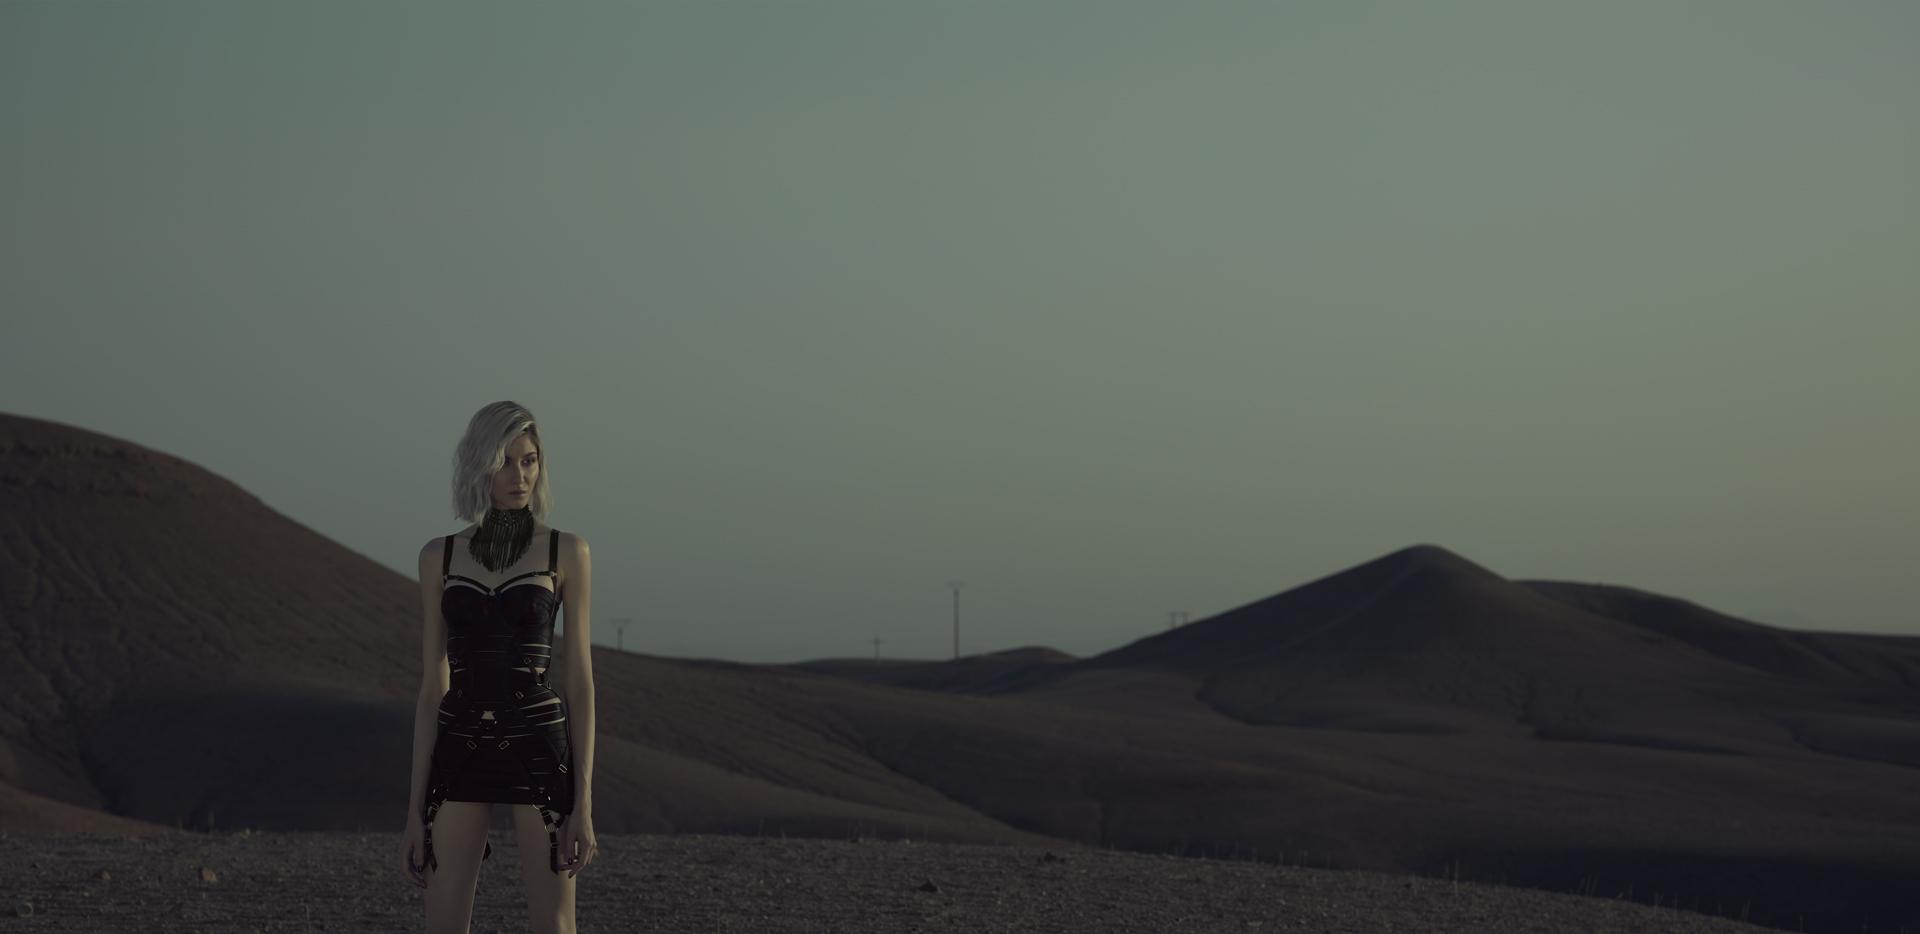 desert american wild lifestyle lingerie bordelle frederic mercier photographer one color